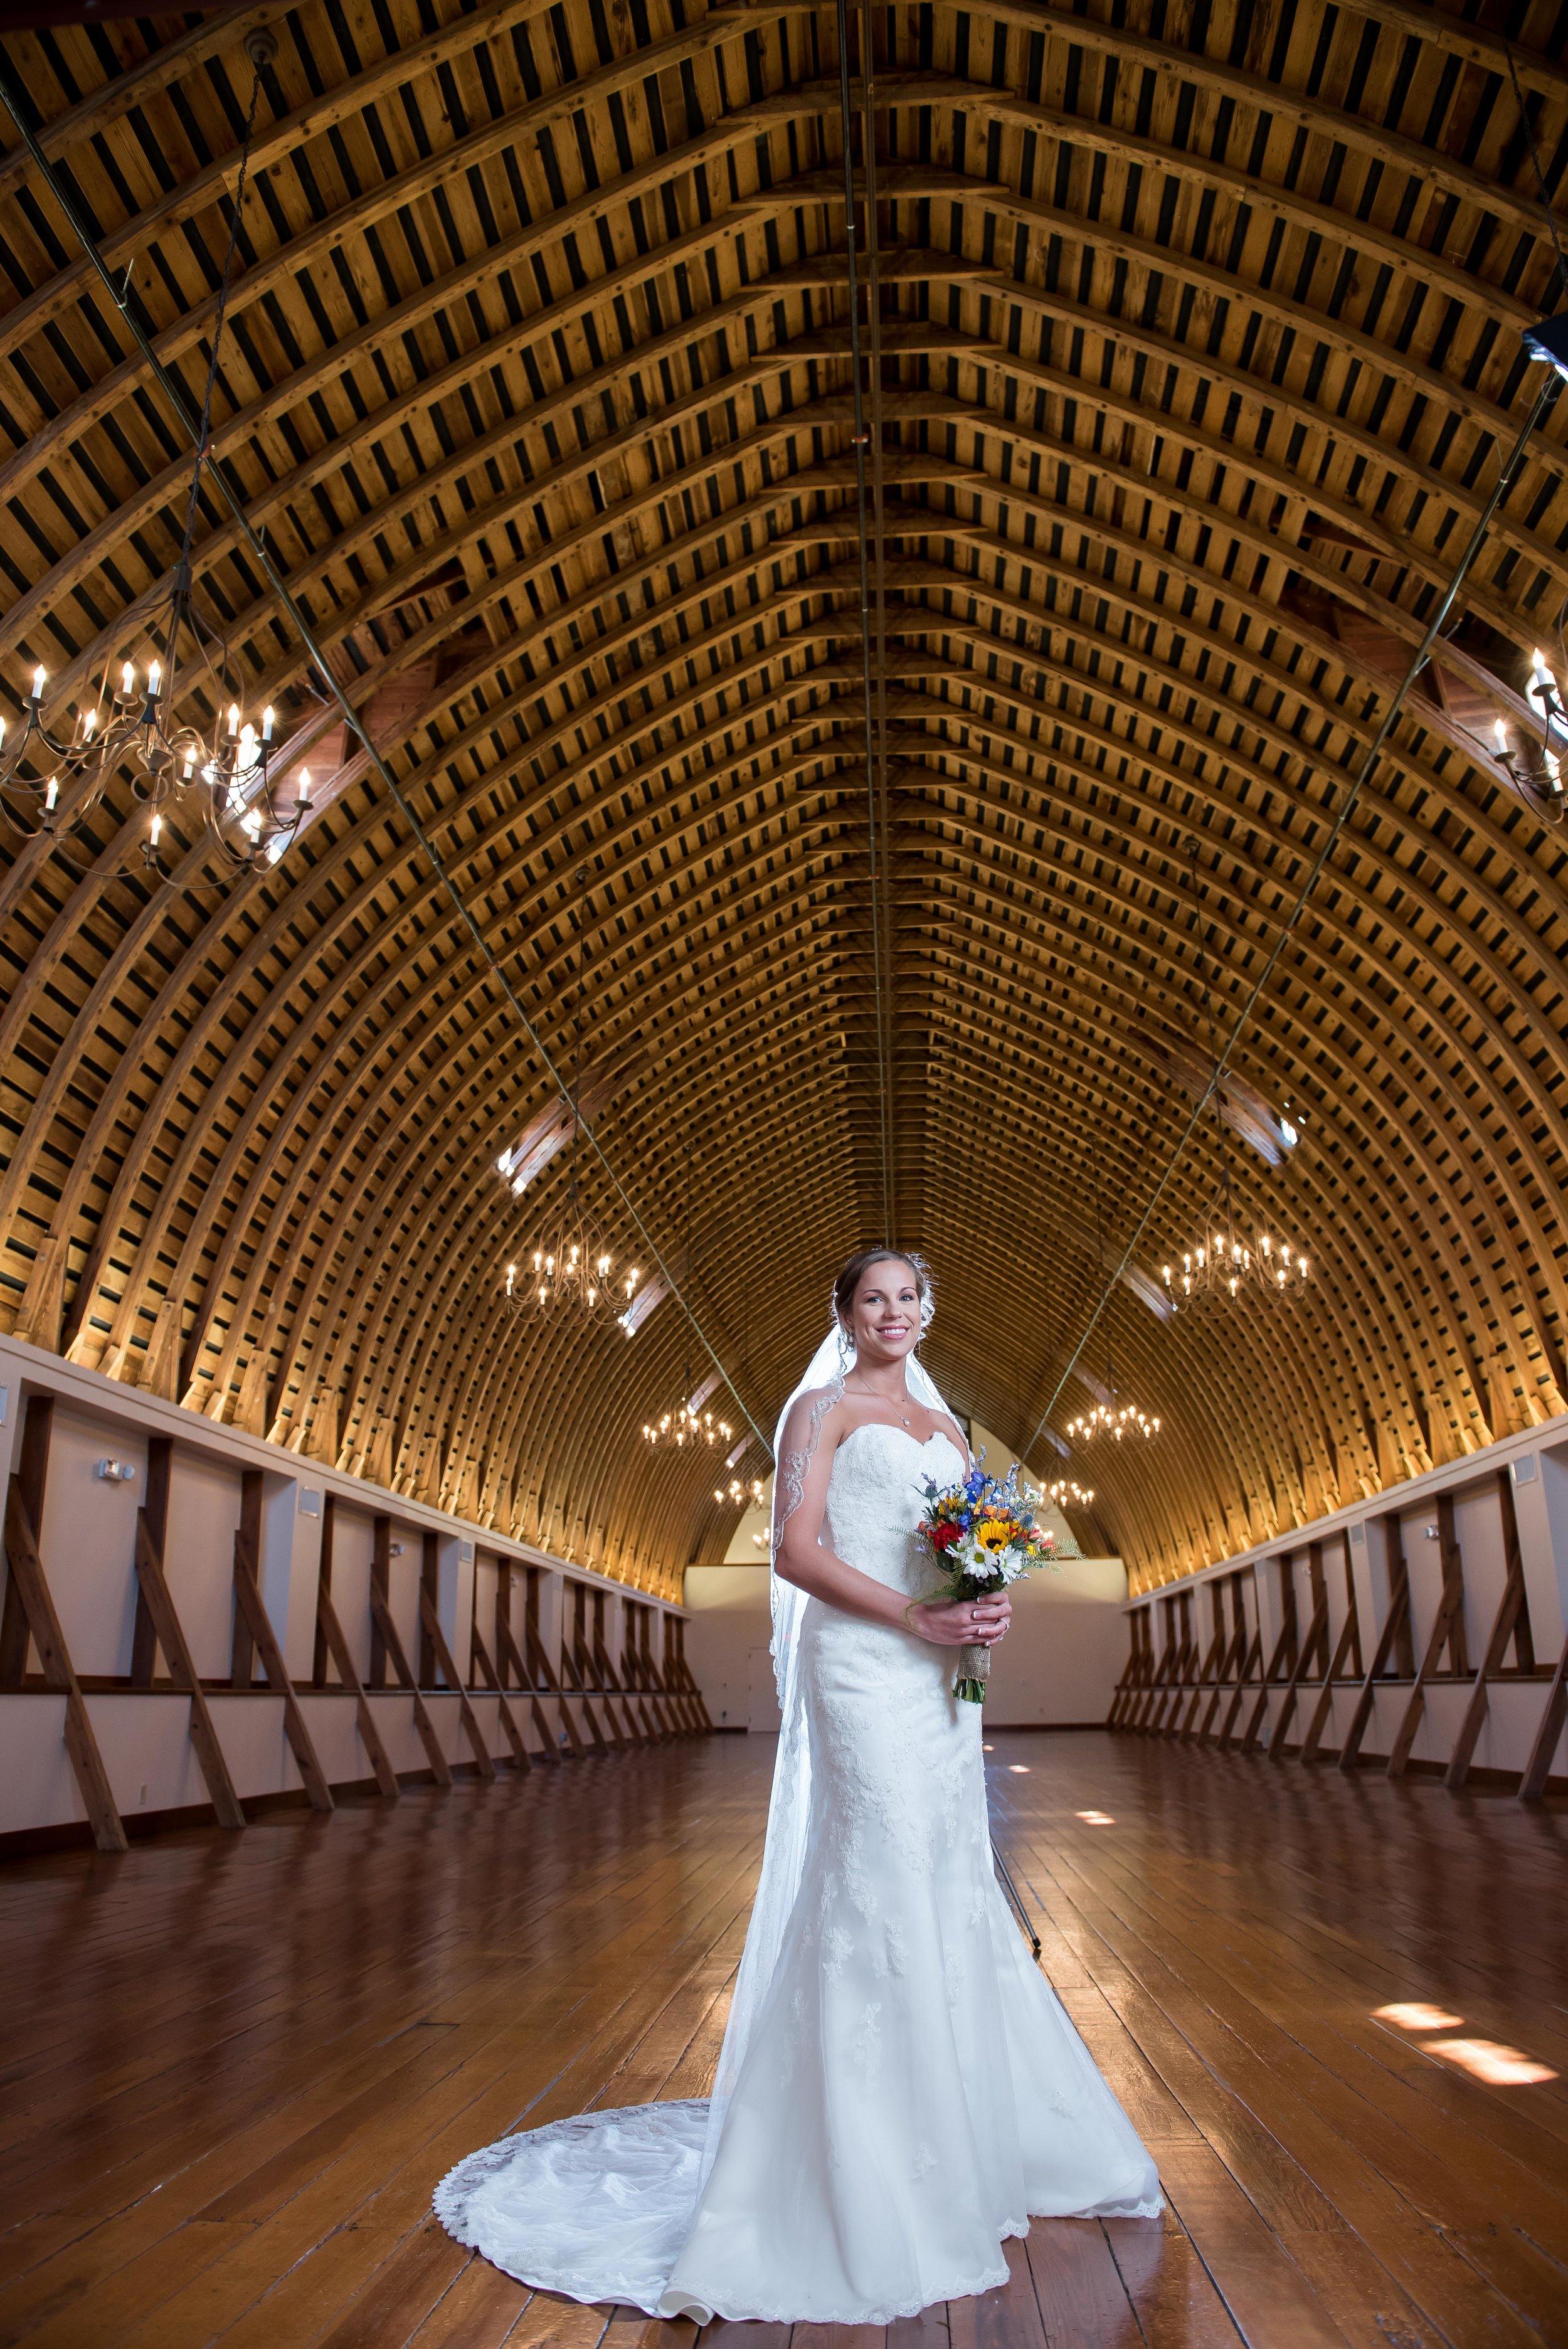 The Winmock at Kinderton | Bermuda Run, NC | Best Wedding Venue in the Piedmont Triad